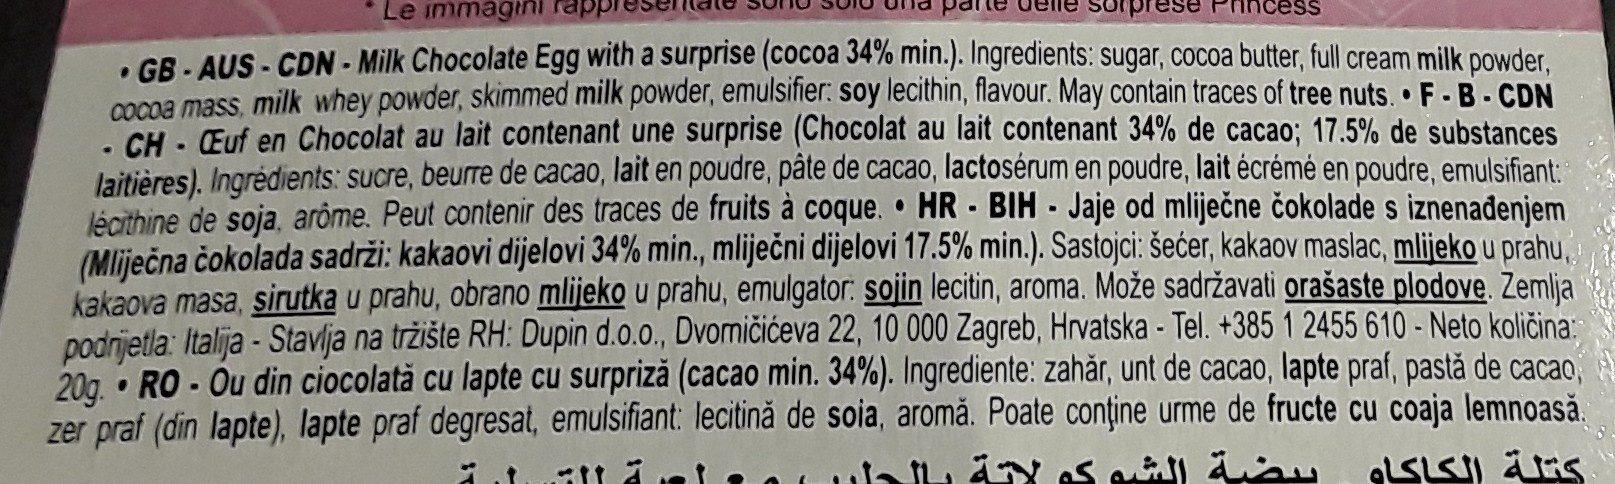 4 oeufs en chocolat - 成分 - fr